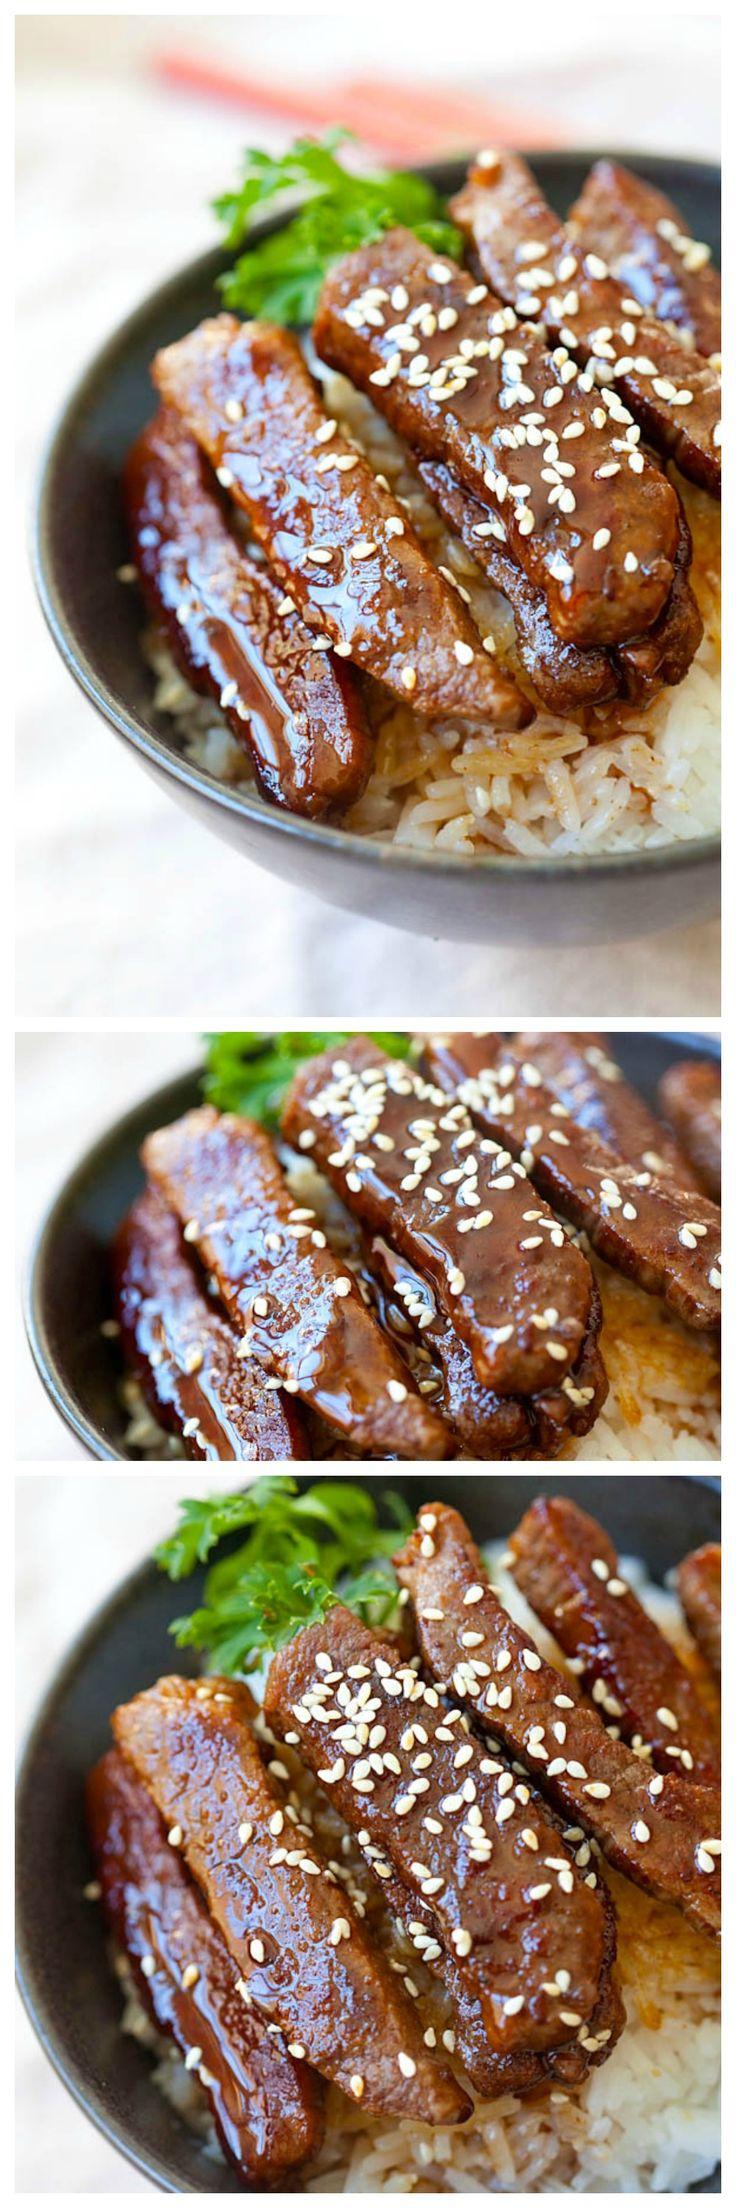 beef teriyaki with your favorite cut of beef and homemade teriyaki